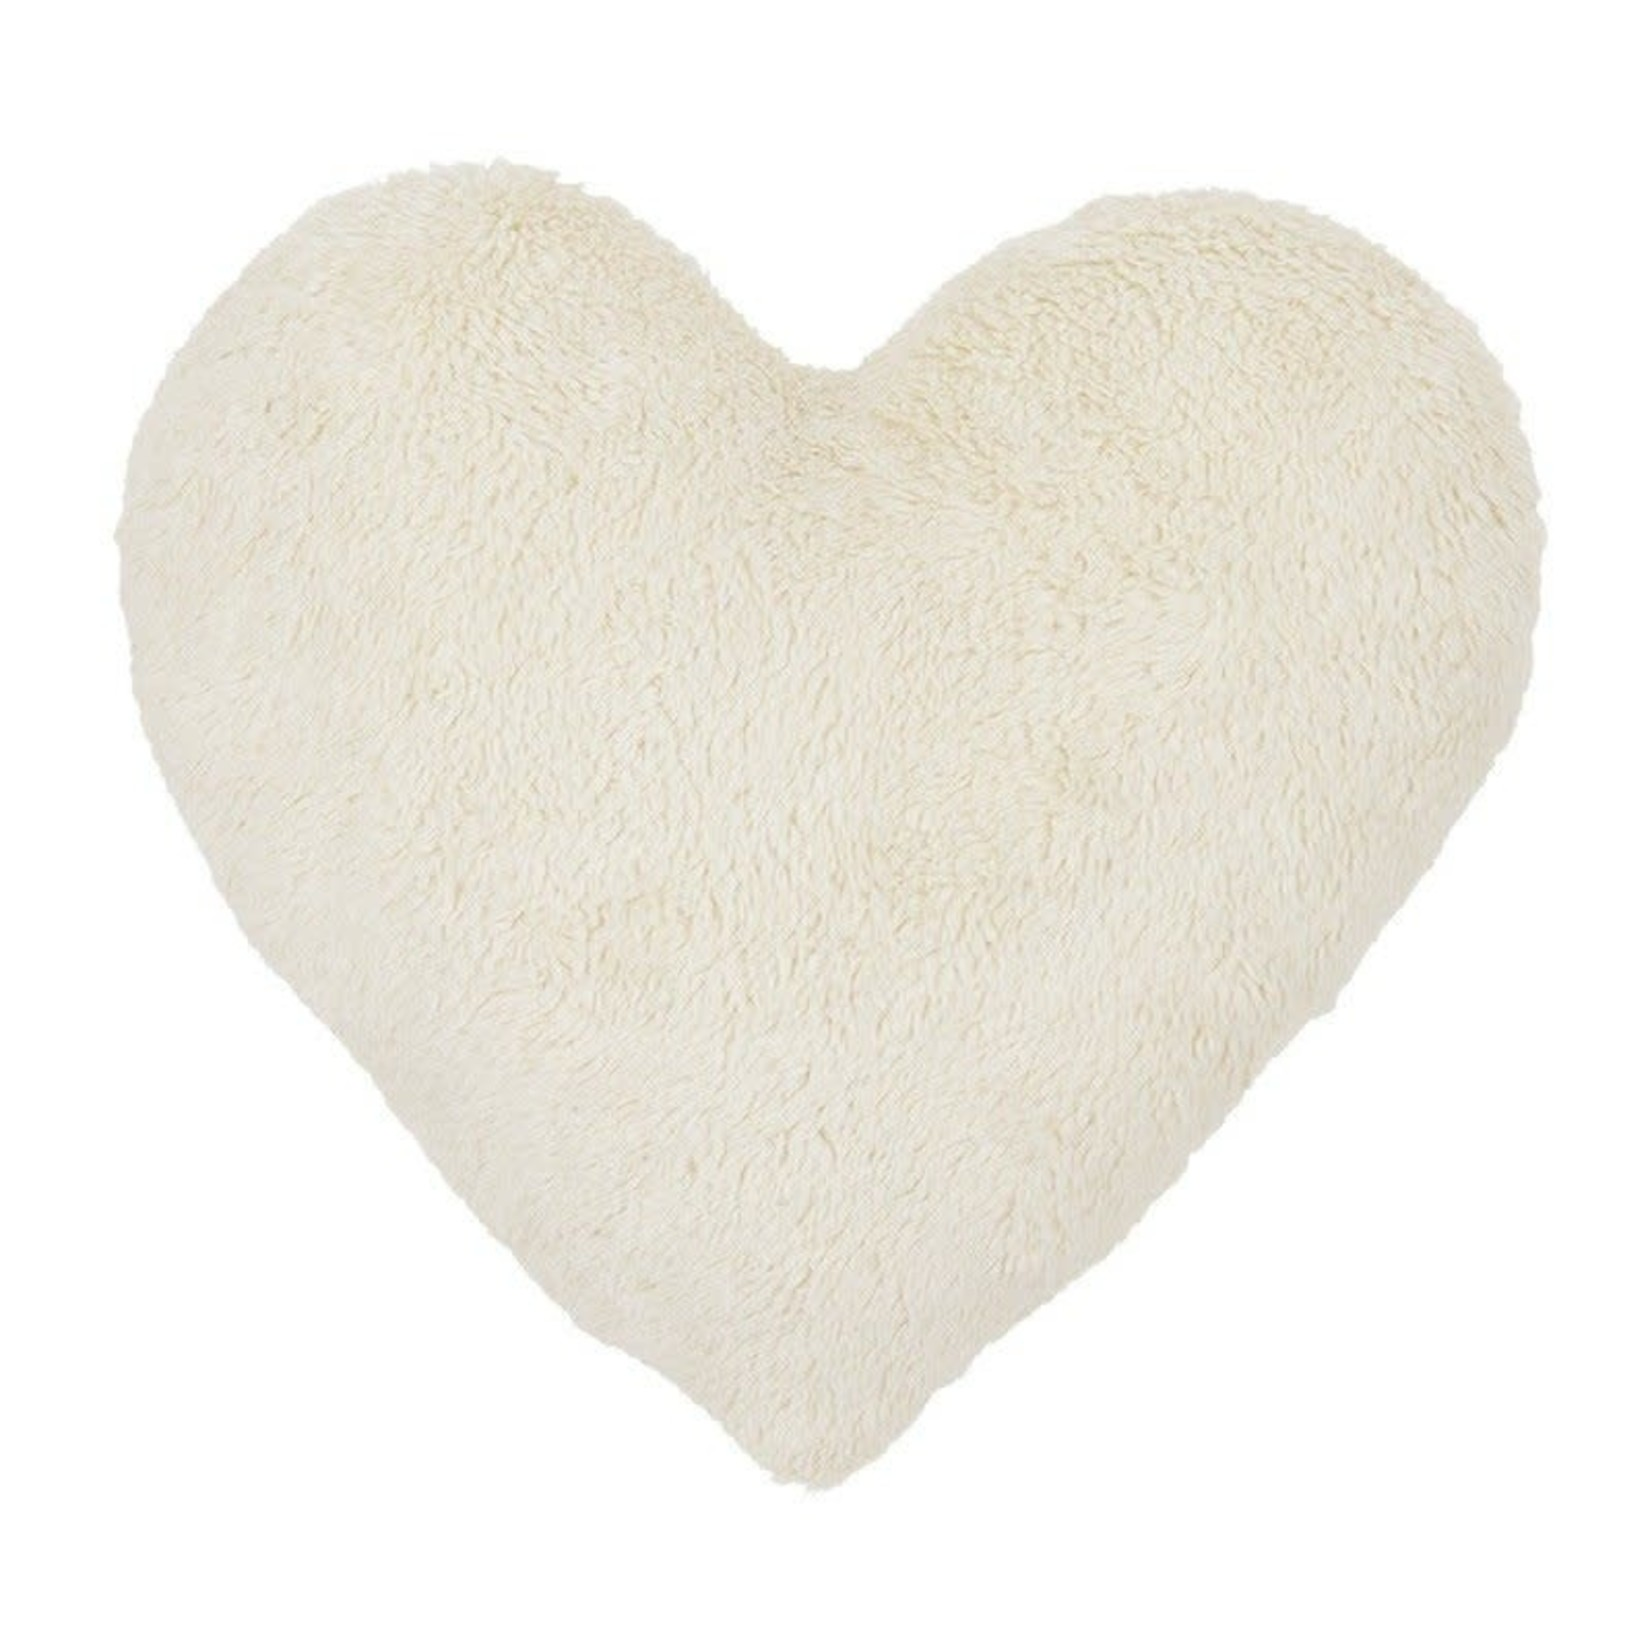 Sheepskin Heart Boho - Pillow